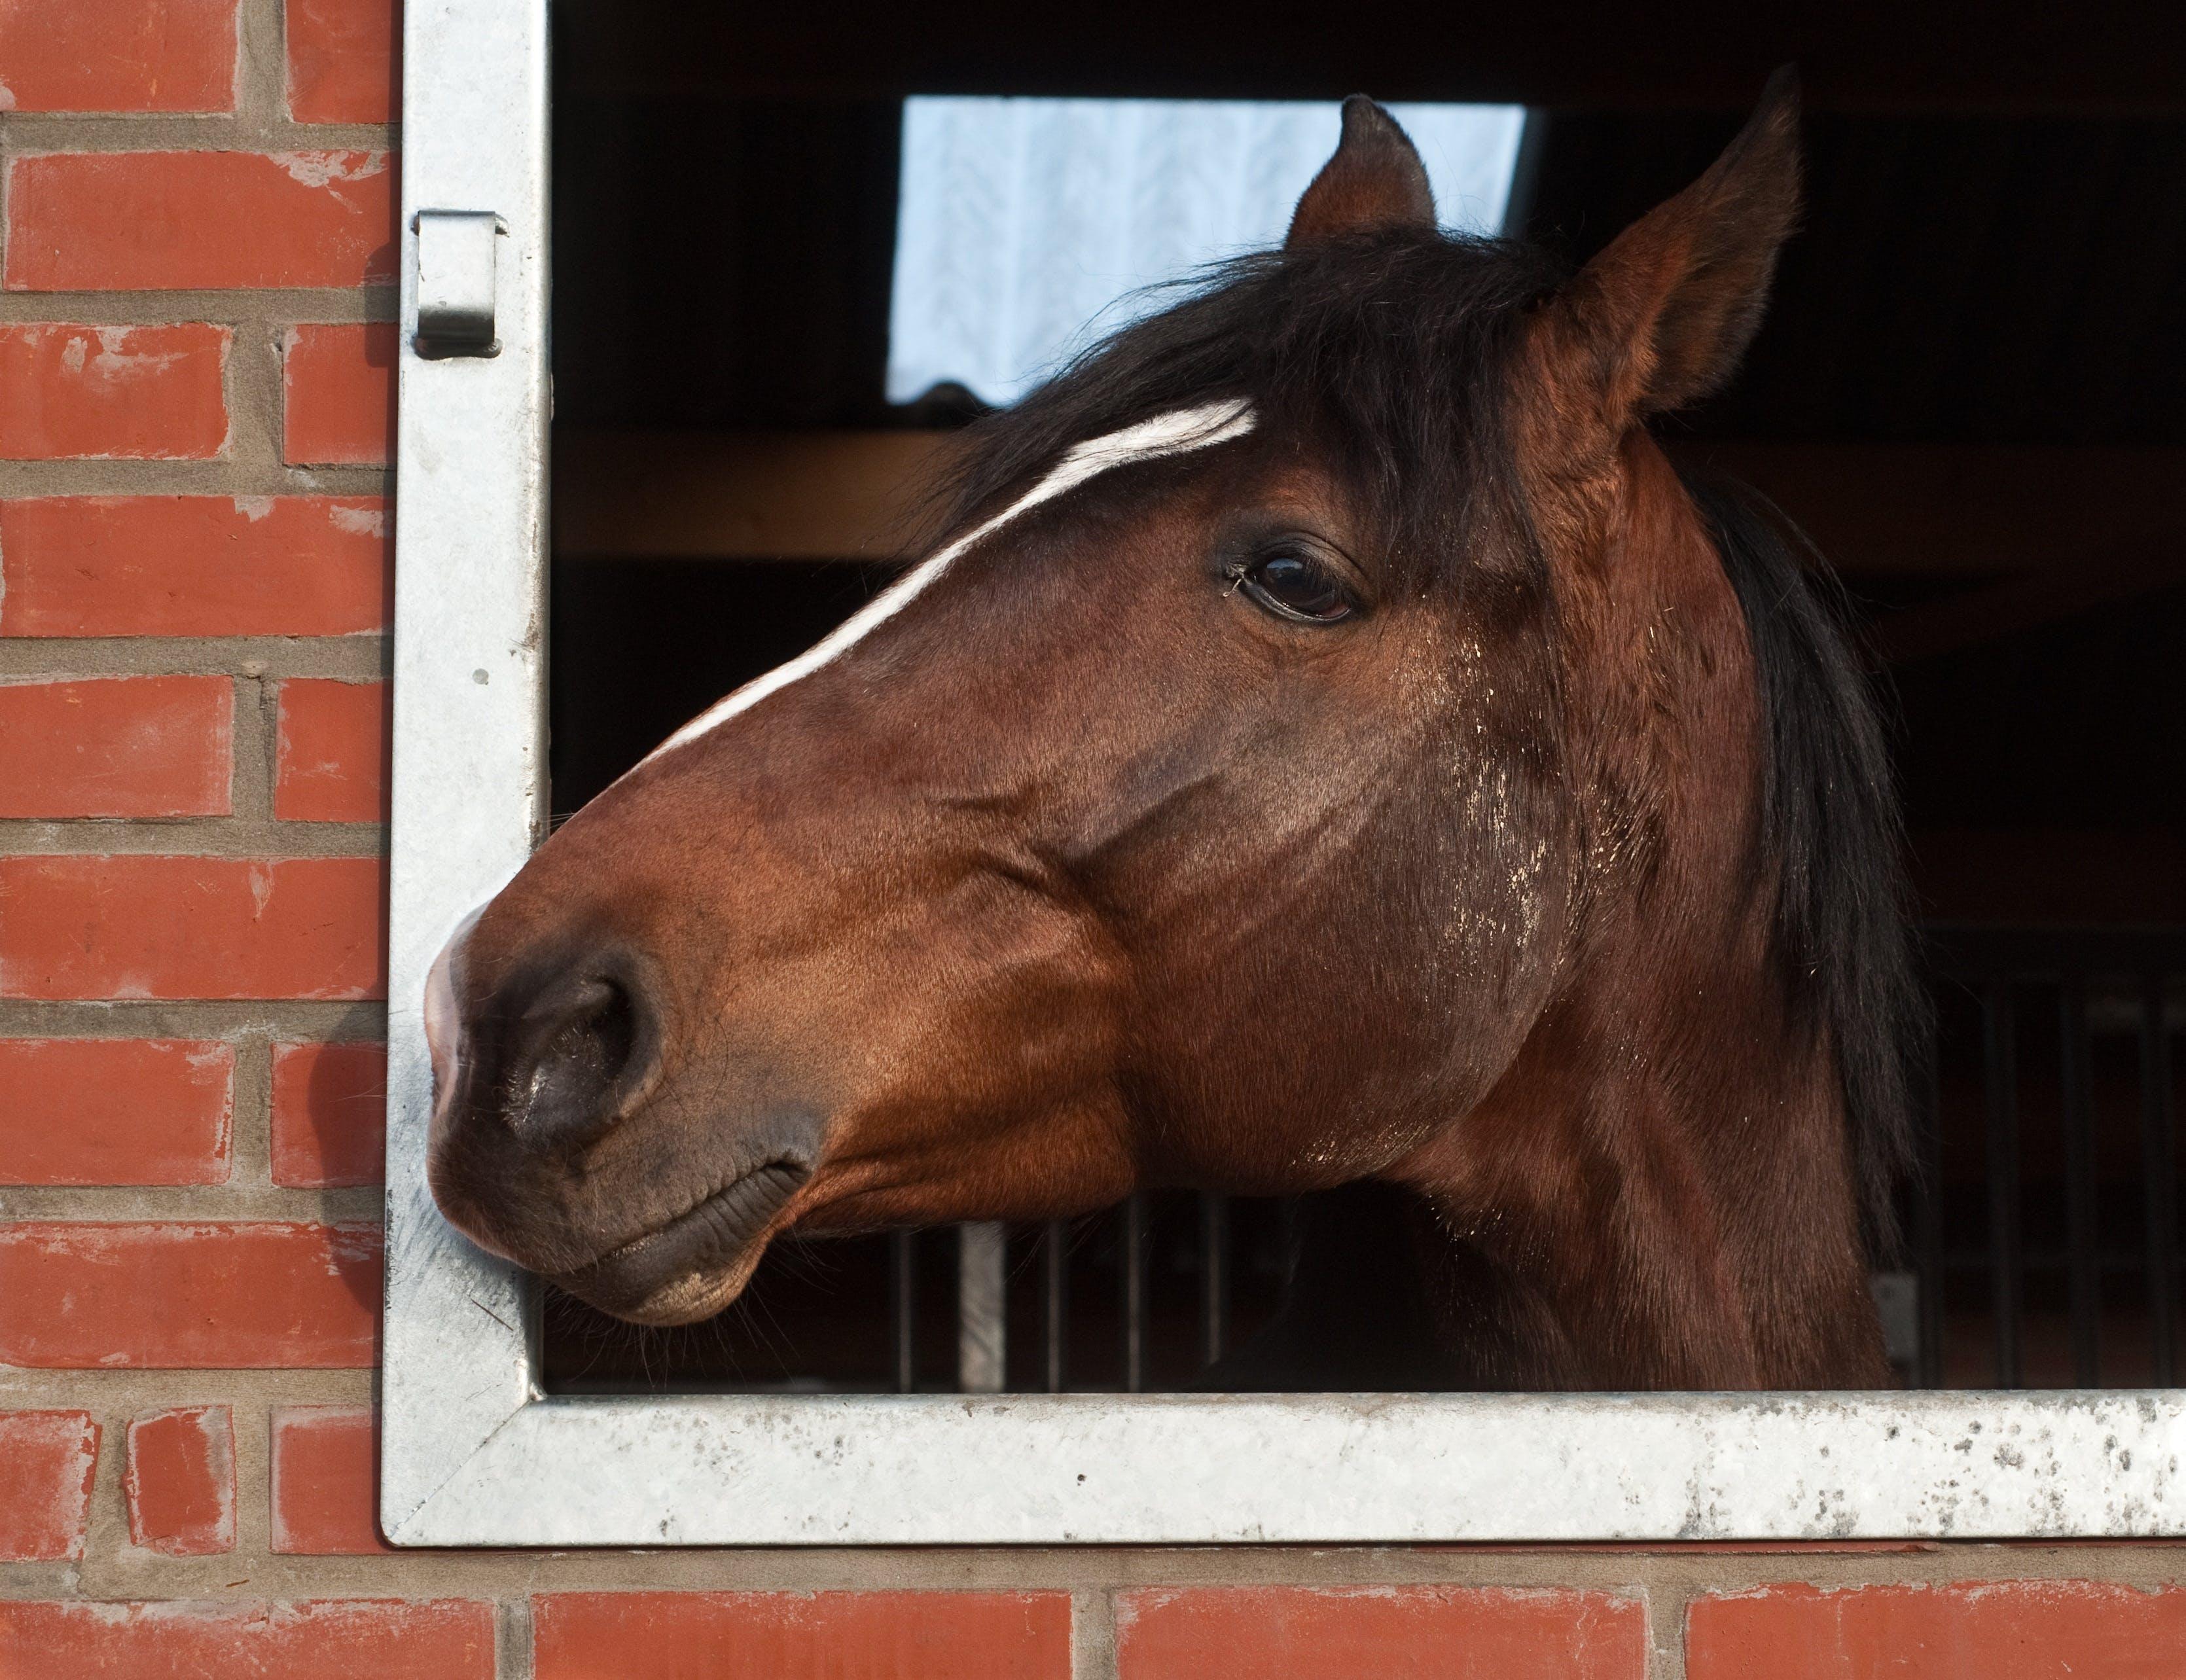 Free stock photo of animal, window, head, horse